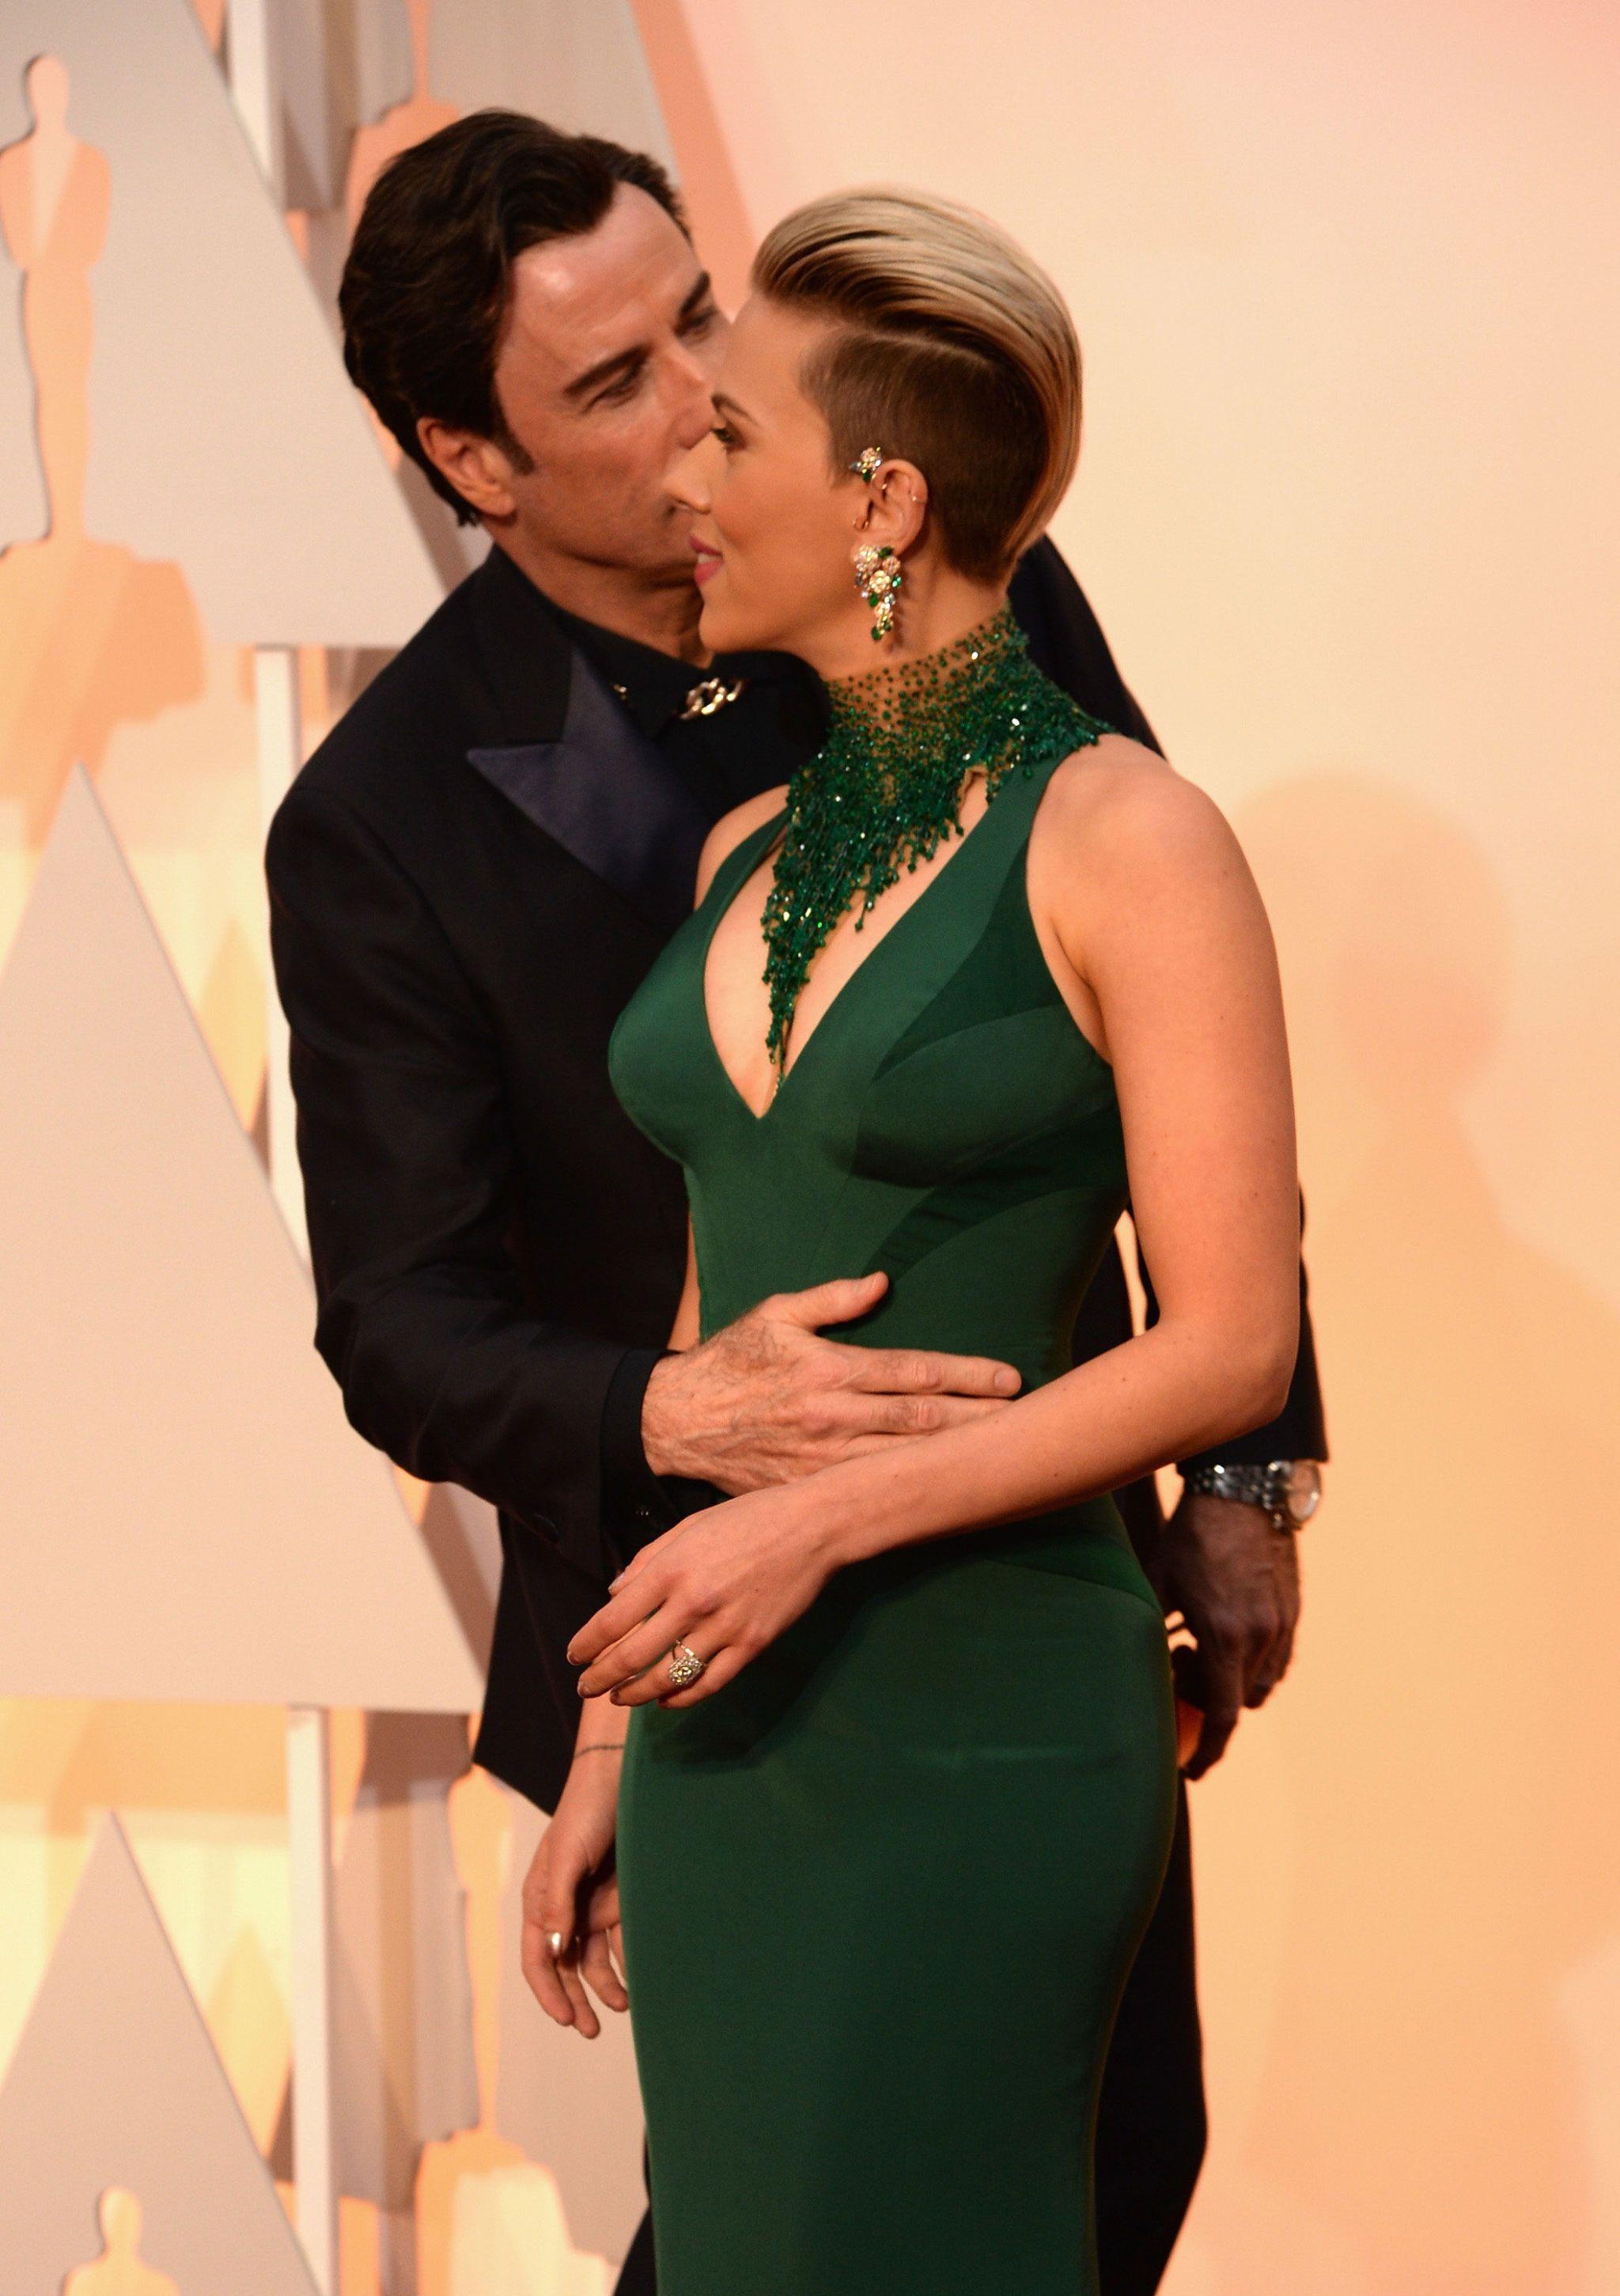 FINALLY Scarlett Johansson explains WTF John Travolta was doing